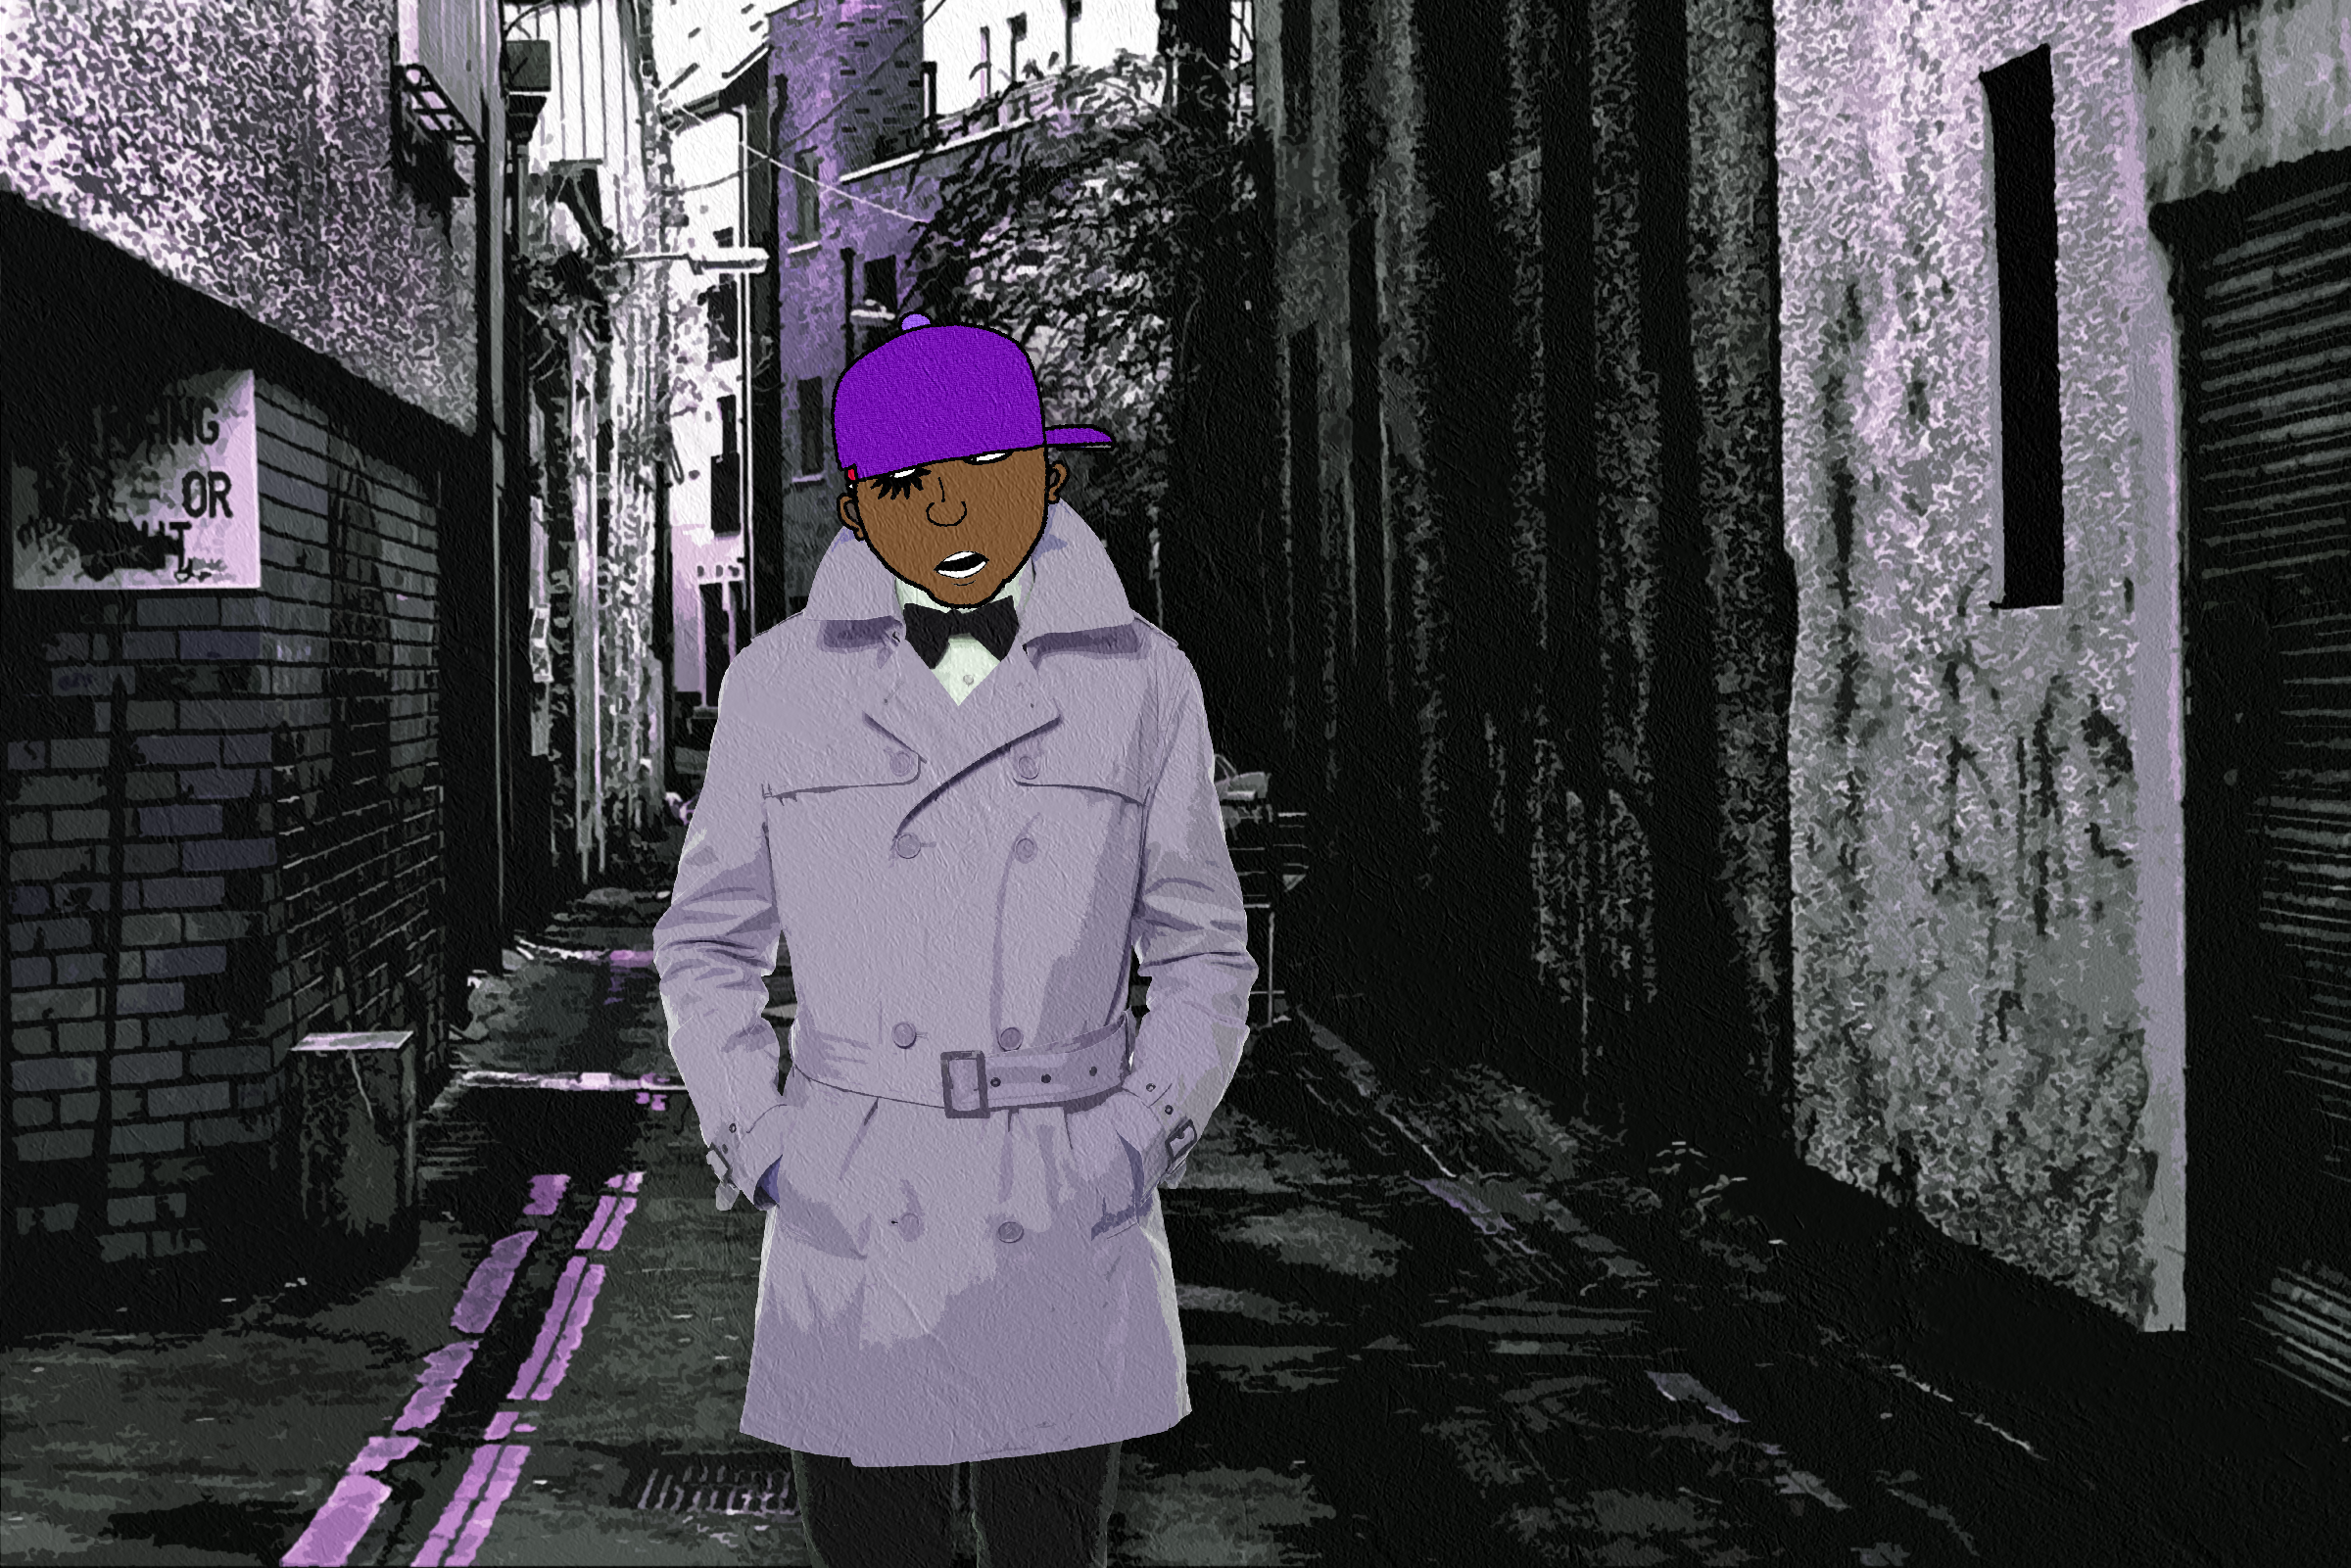 BlackDroog-Alley.png